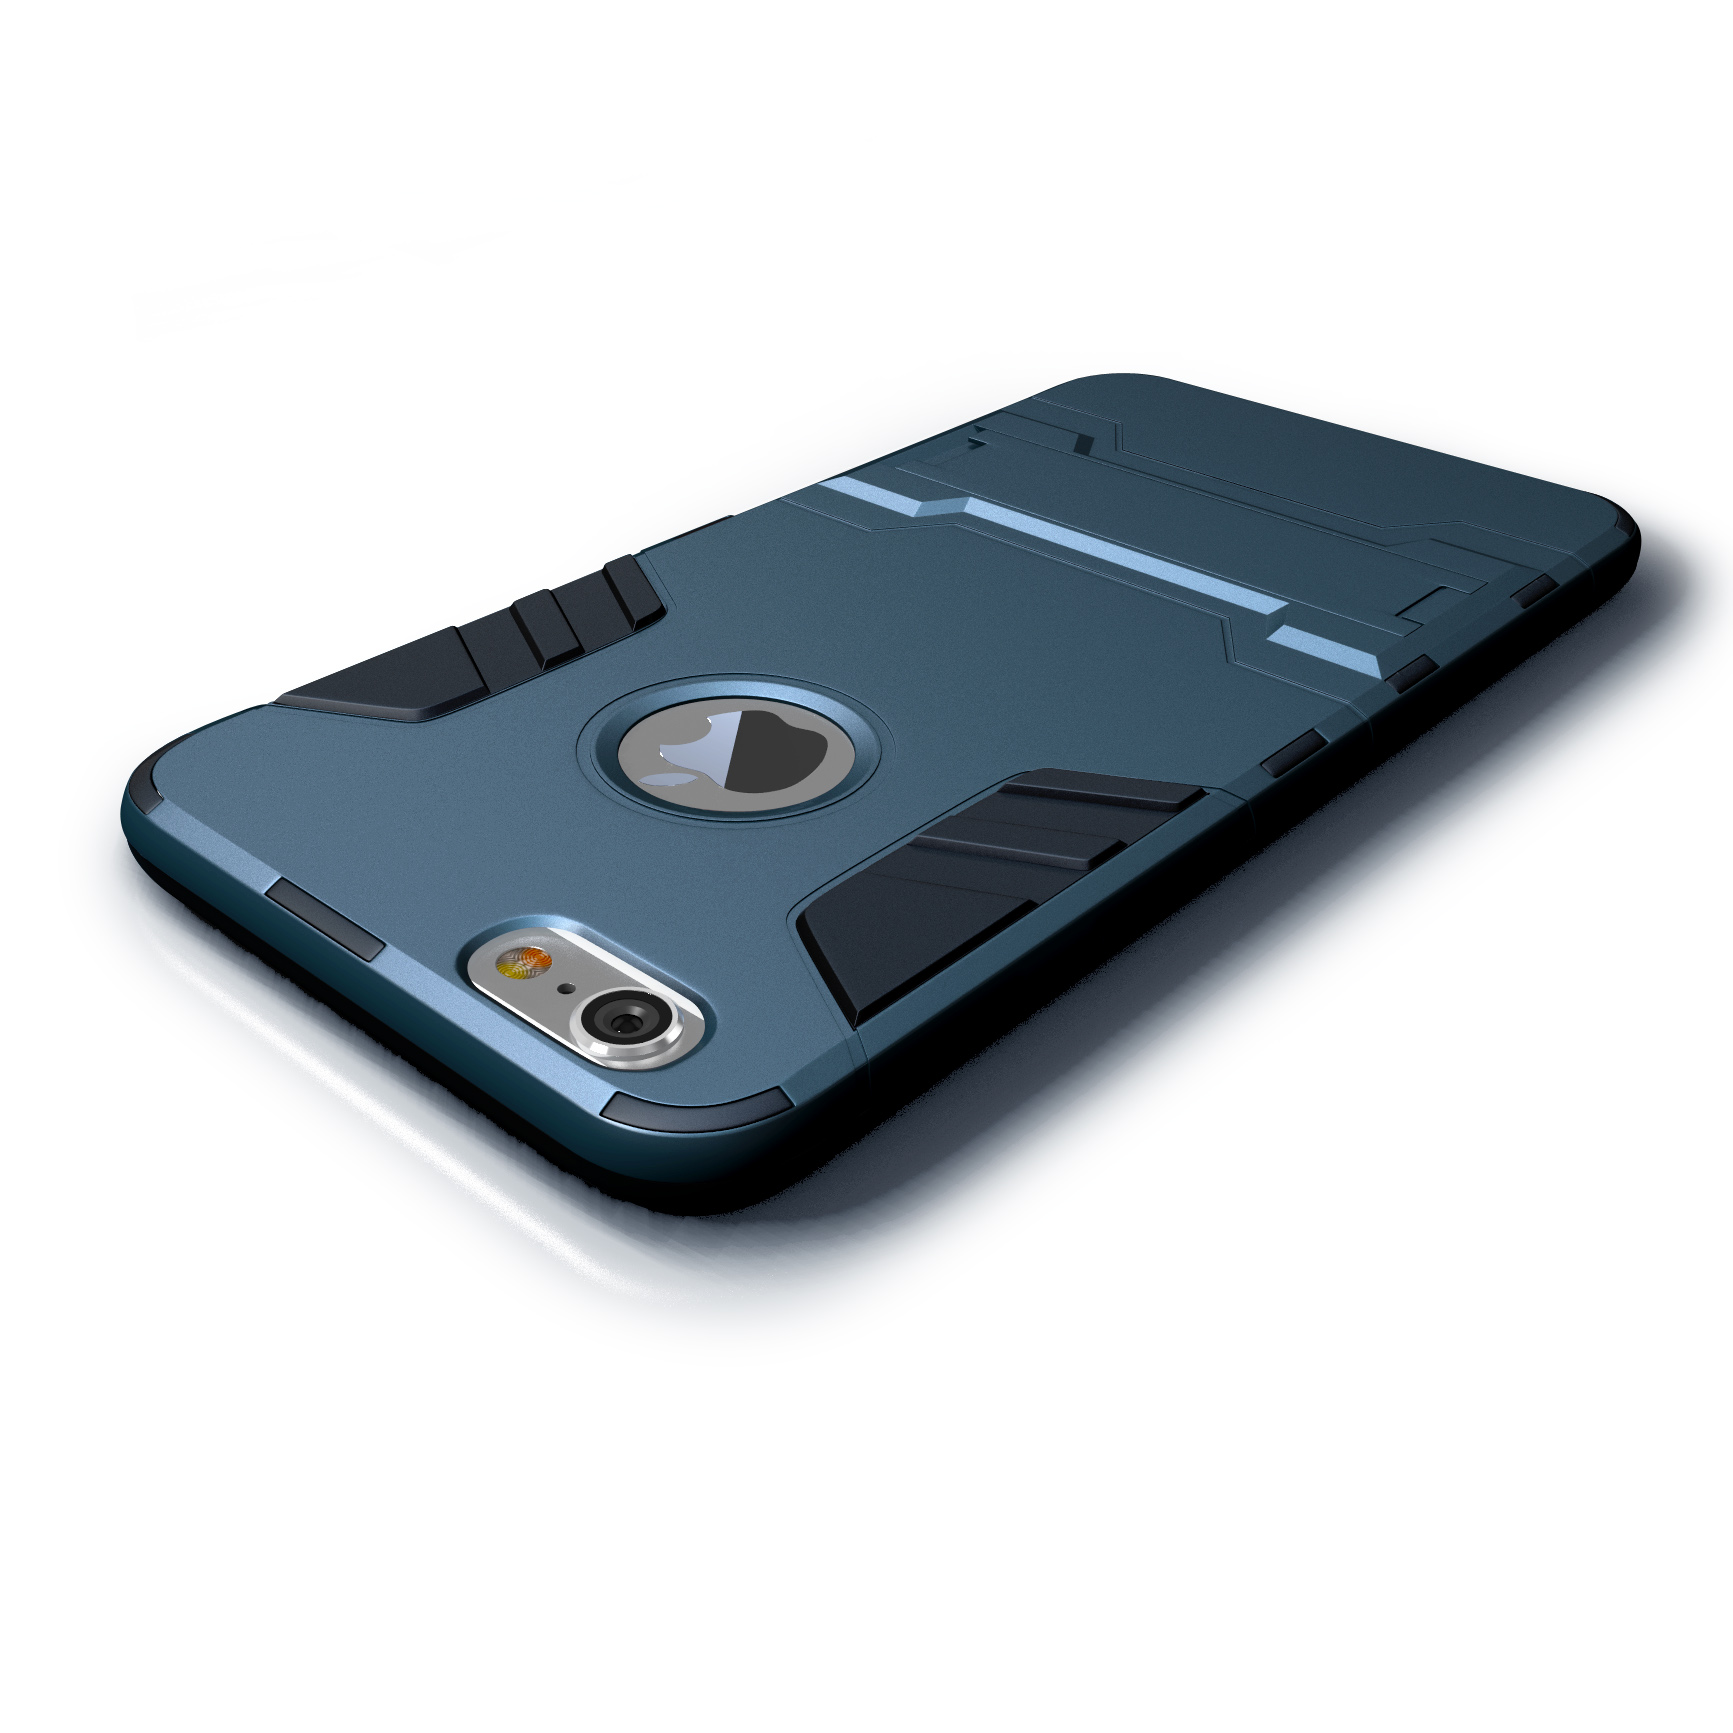 iphone6手機殼全包外殼蘋果6 plus保護套防摔潮男6s 支架7